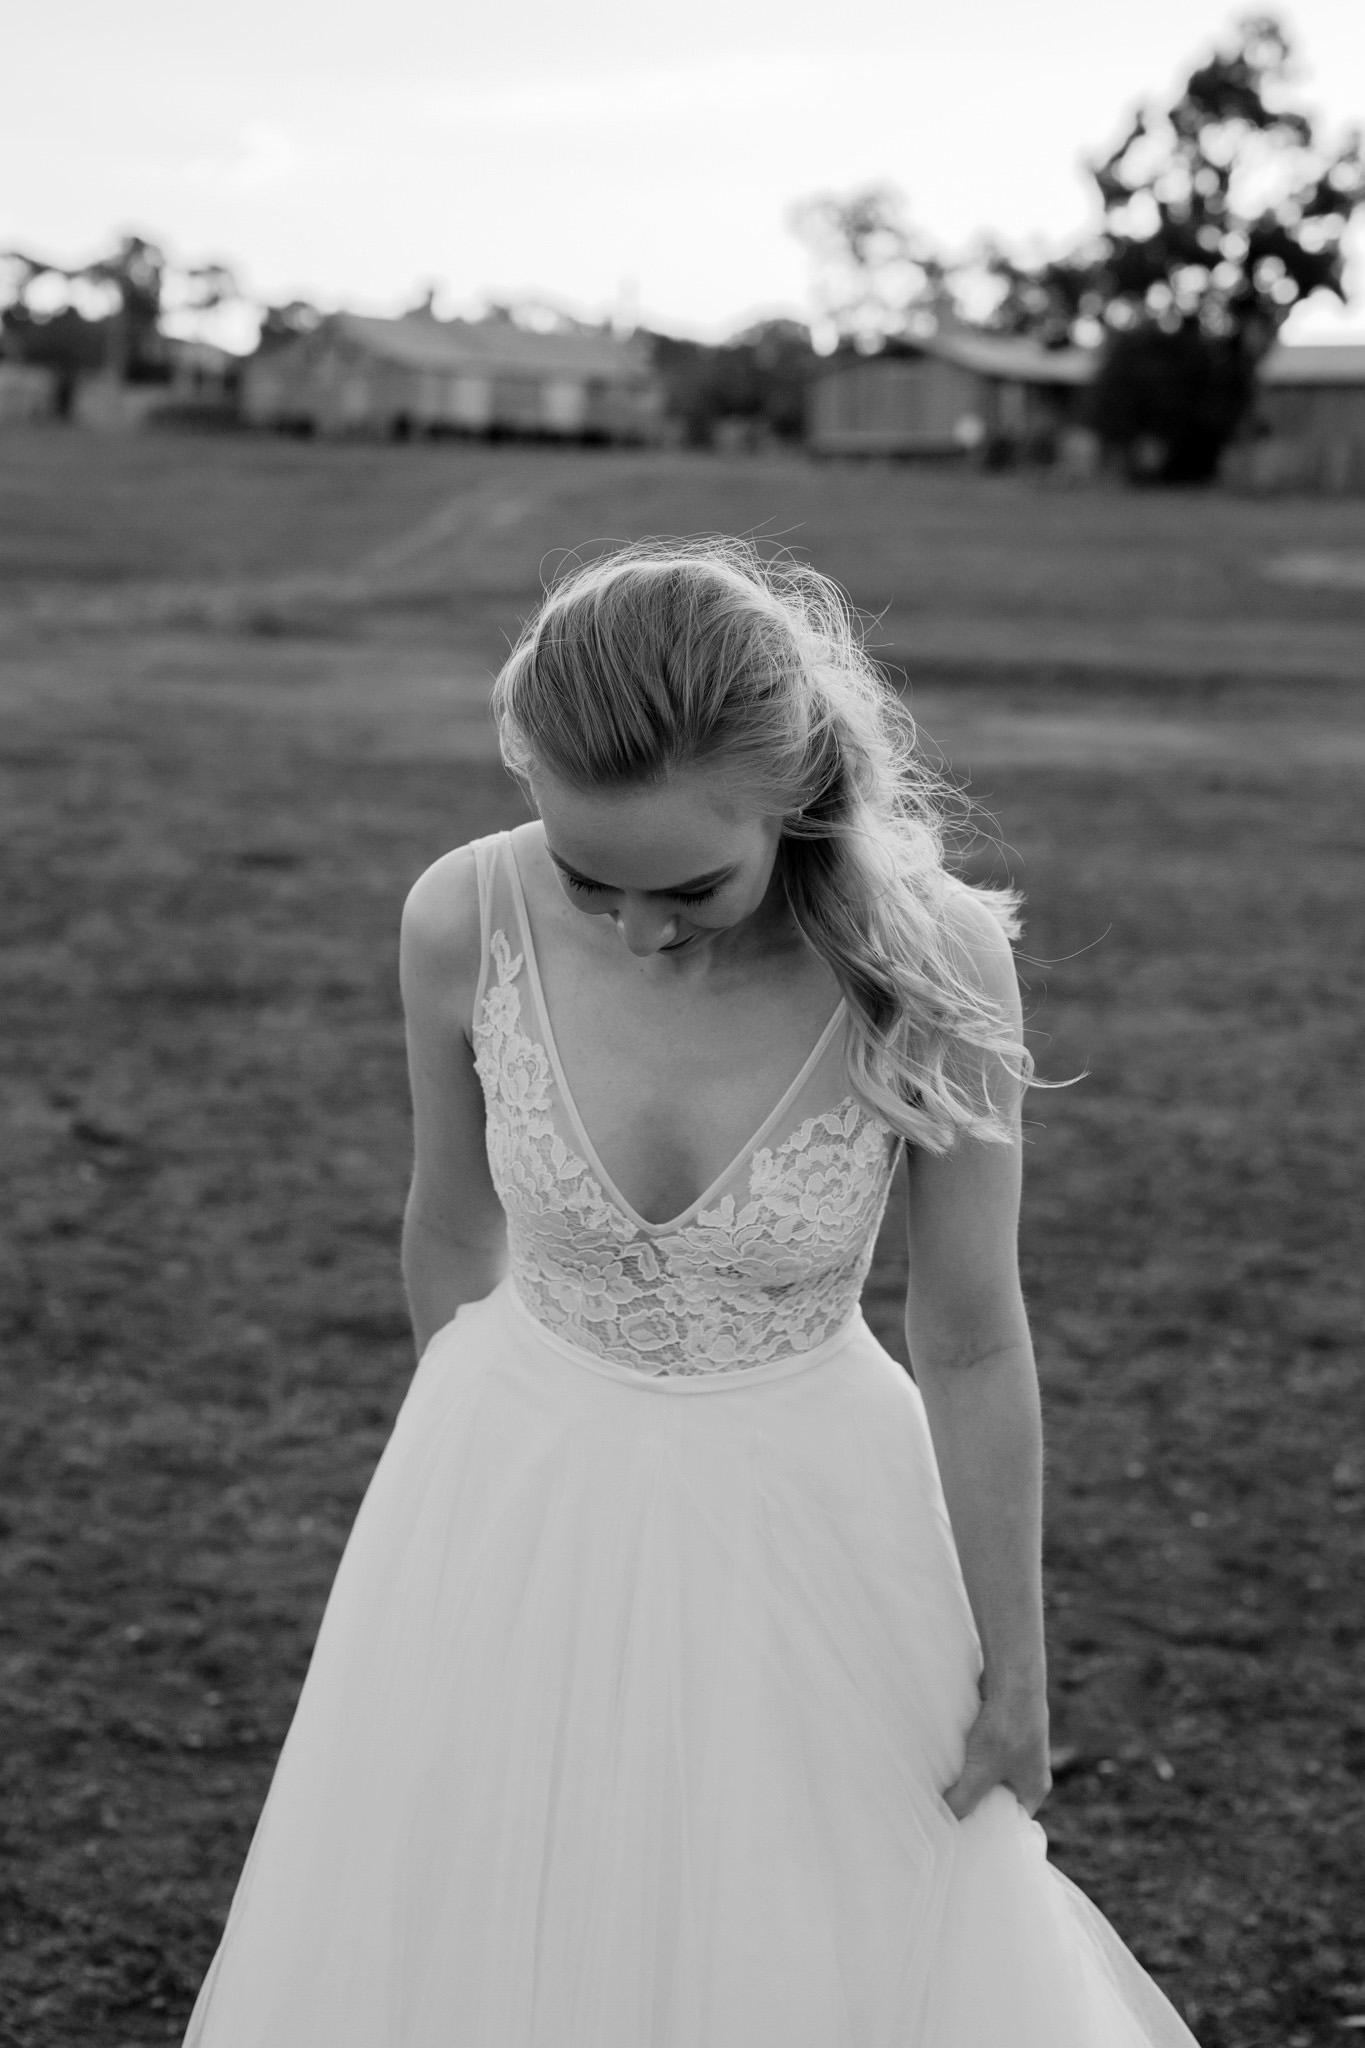 Erin_Latimore_Mudgee_Canberra_Wedding_Photographer_Tuggeranong_Homestead_509.JPG